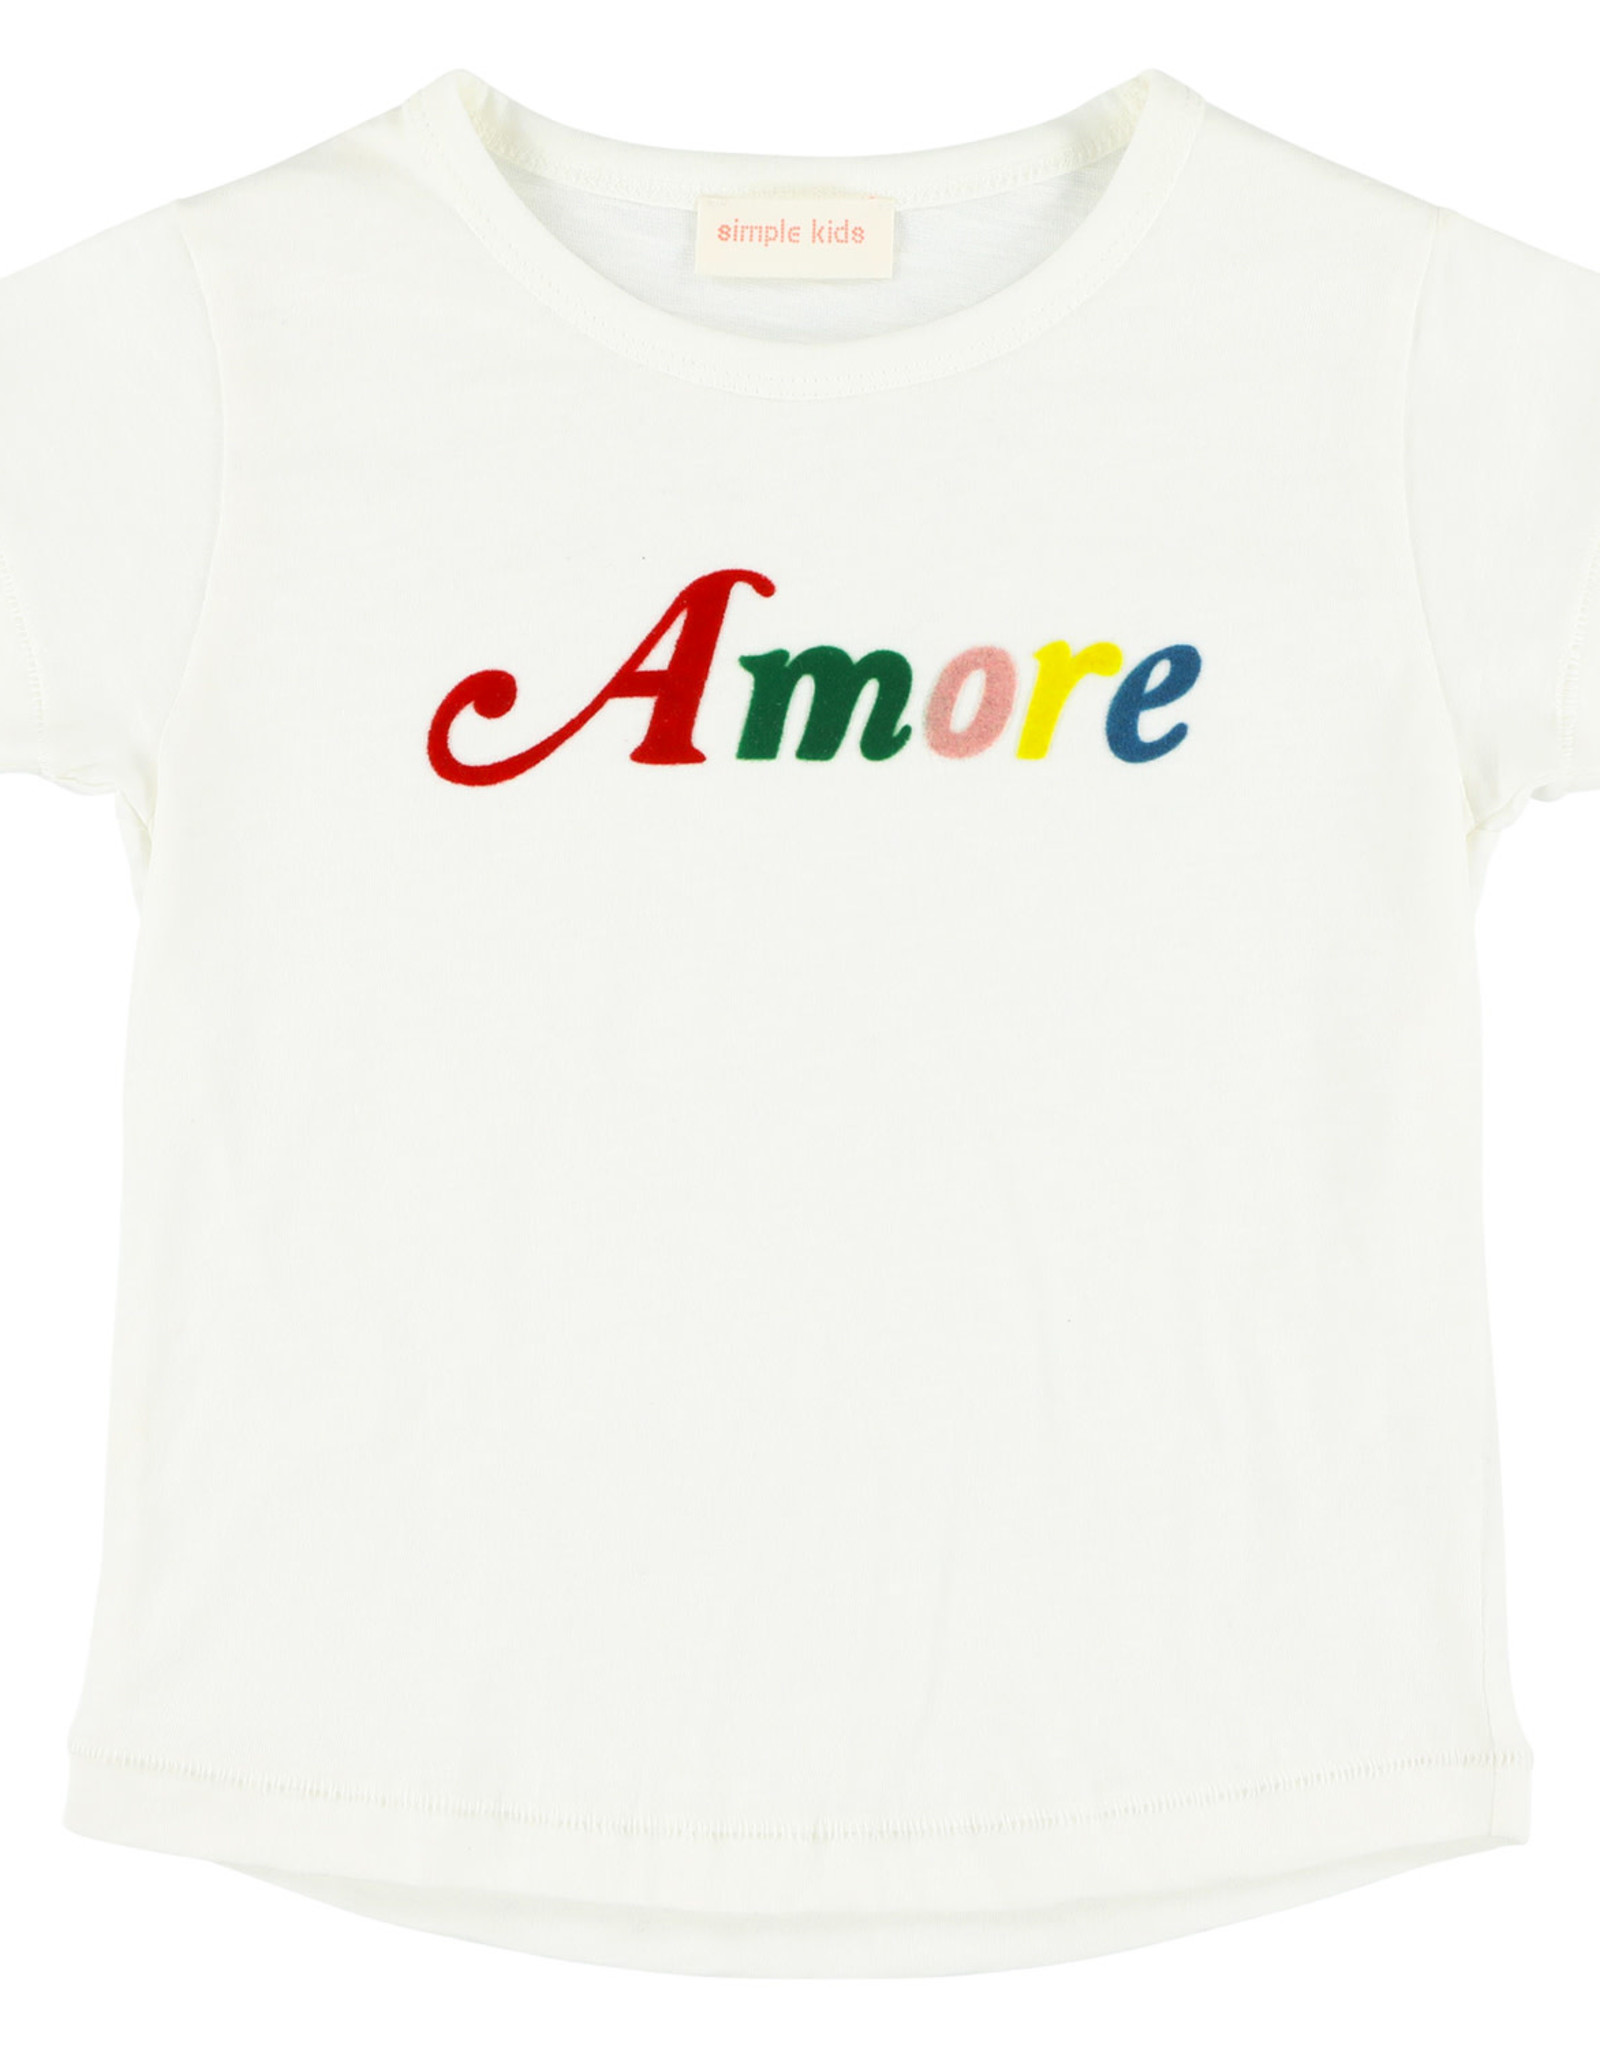 SIMPLE KIDS SIMPLE KIDS Amore white